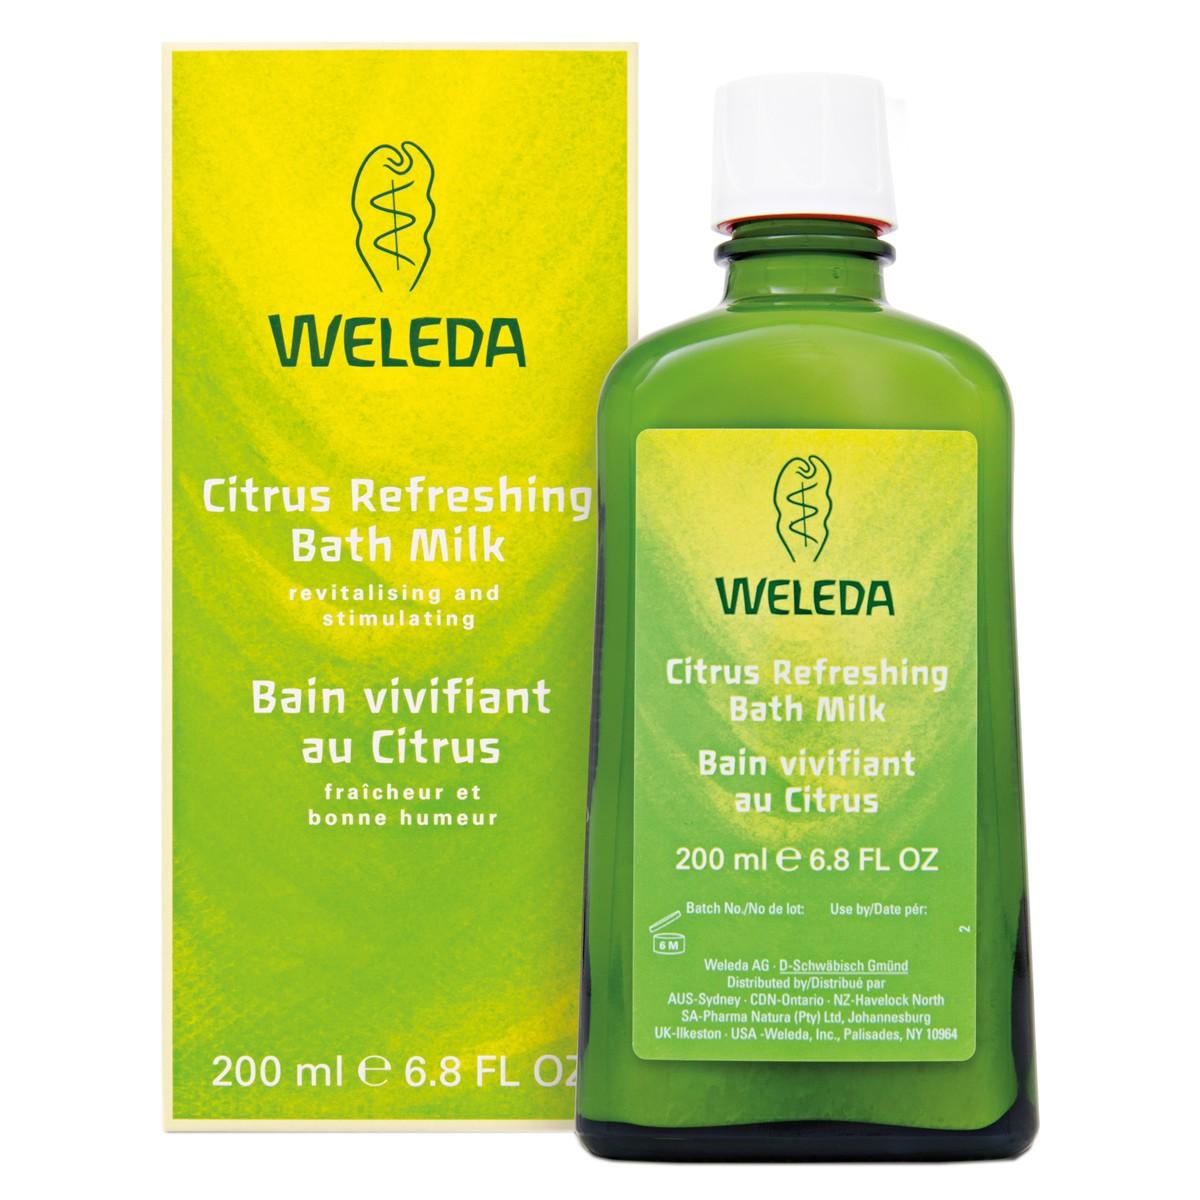 Weleda Citrus Refreshing Bath Milk